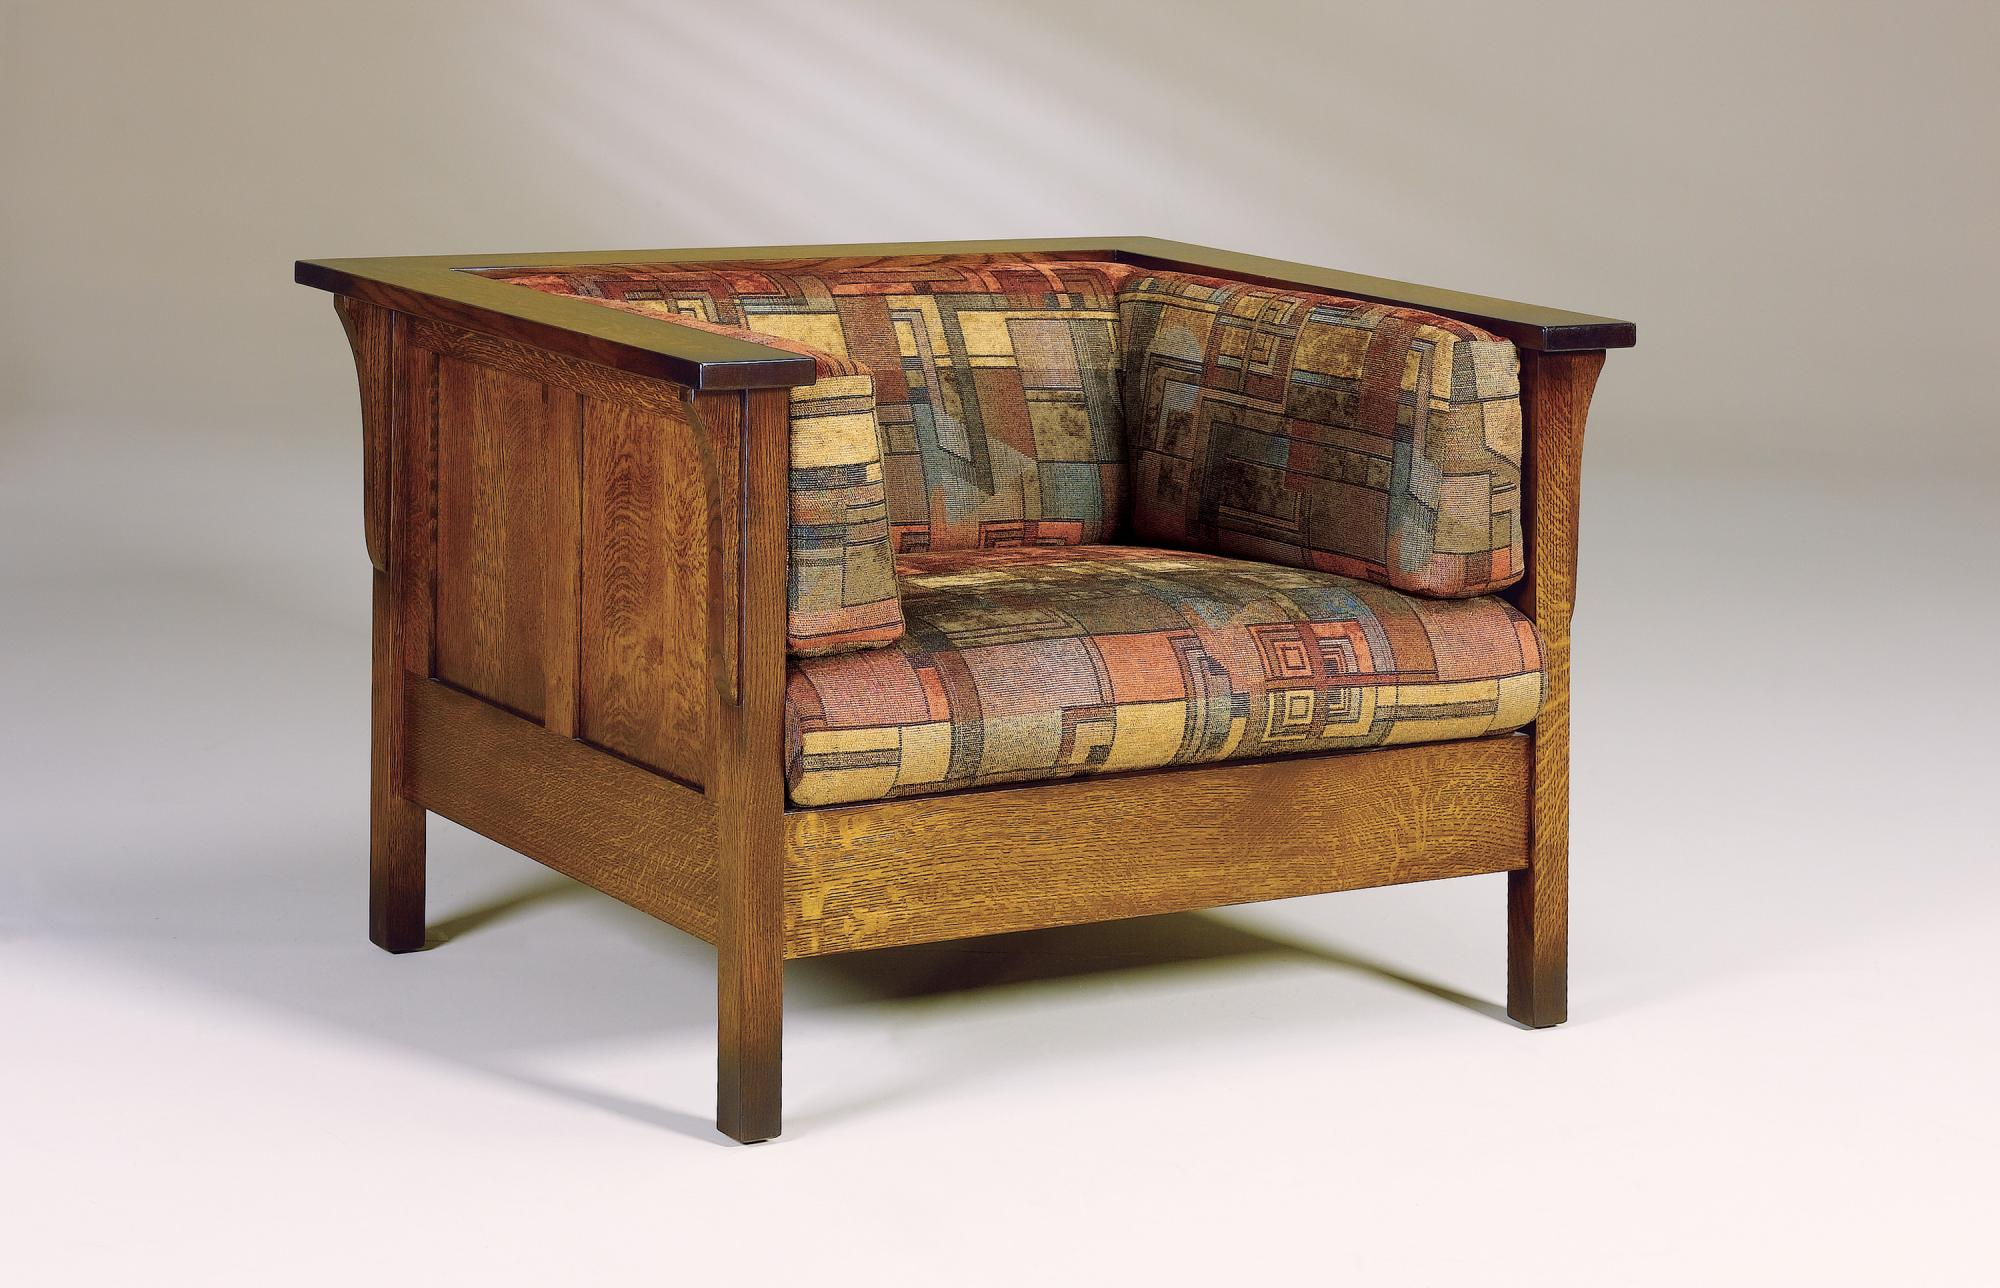 Cubic Amish Furniture Store Mankato Mn